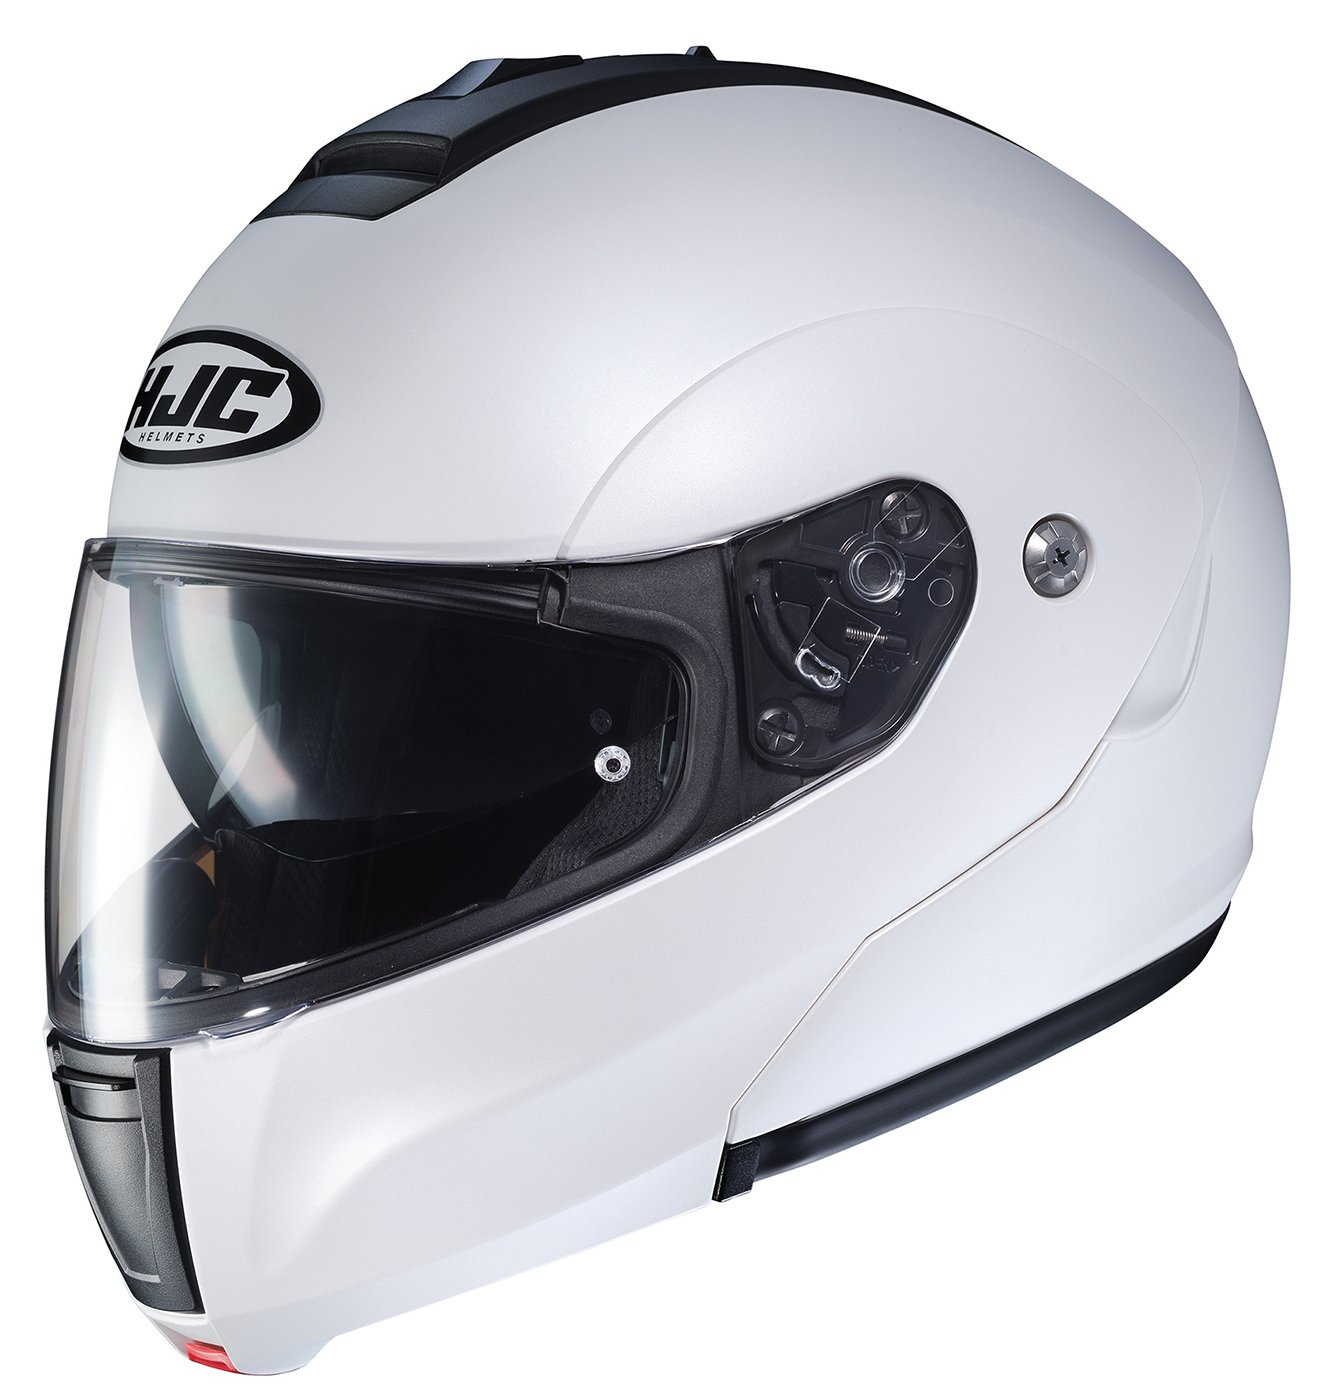 Semi Flat Pearl White//Large 0846-0149-06 HJC Helmets Solid Mens CL-MAX 3 Modular Street Motorcycle Helmet